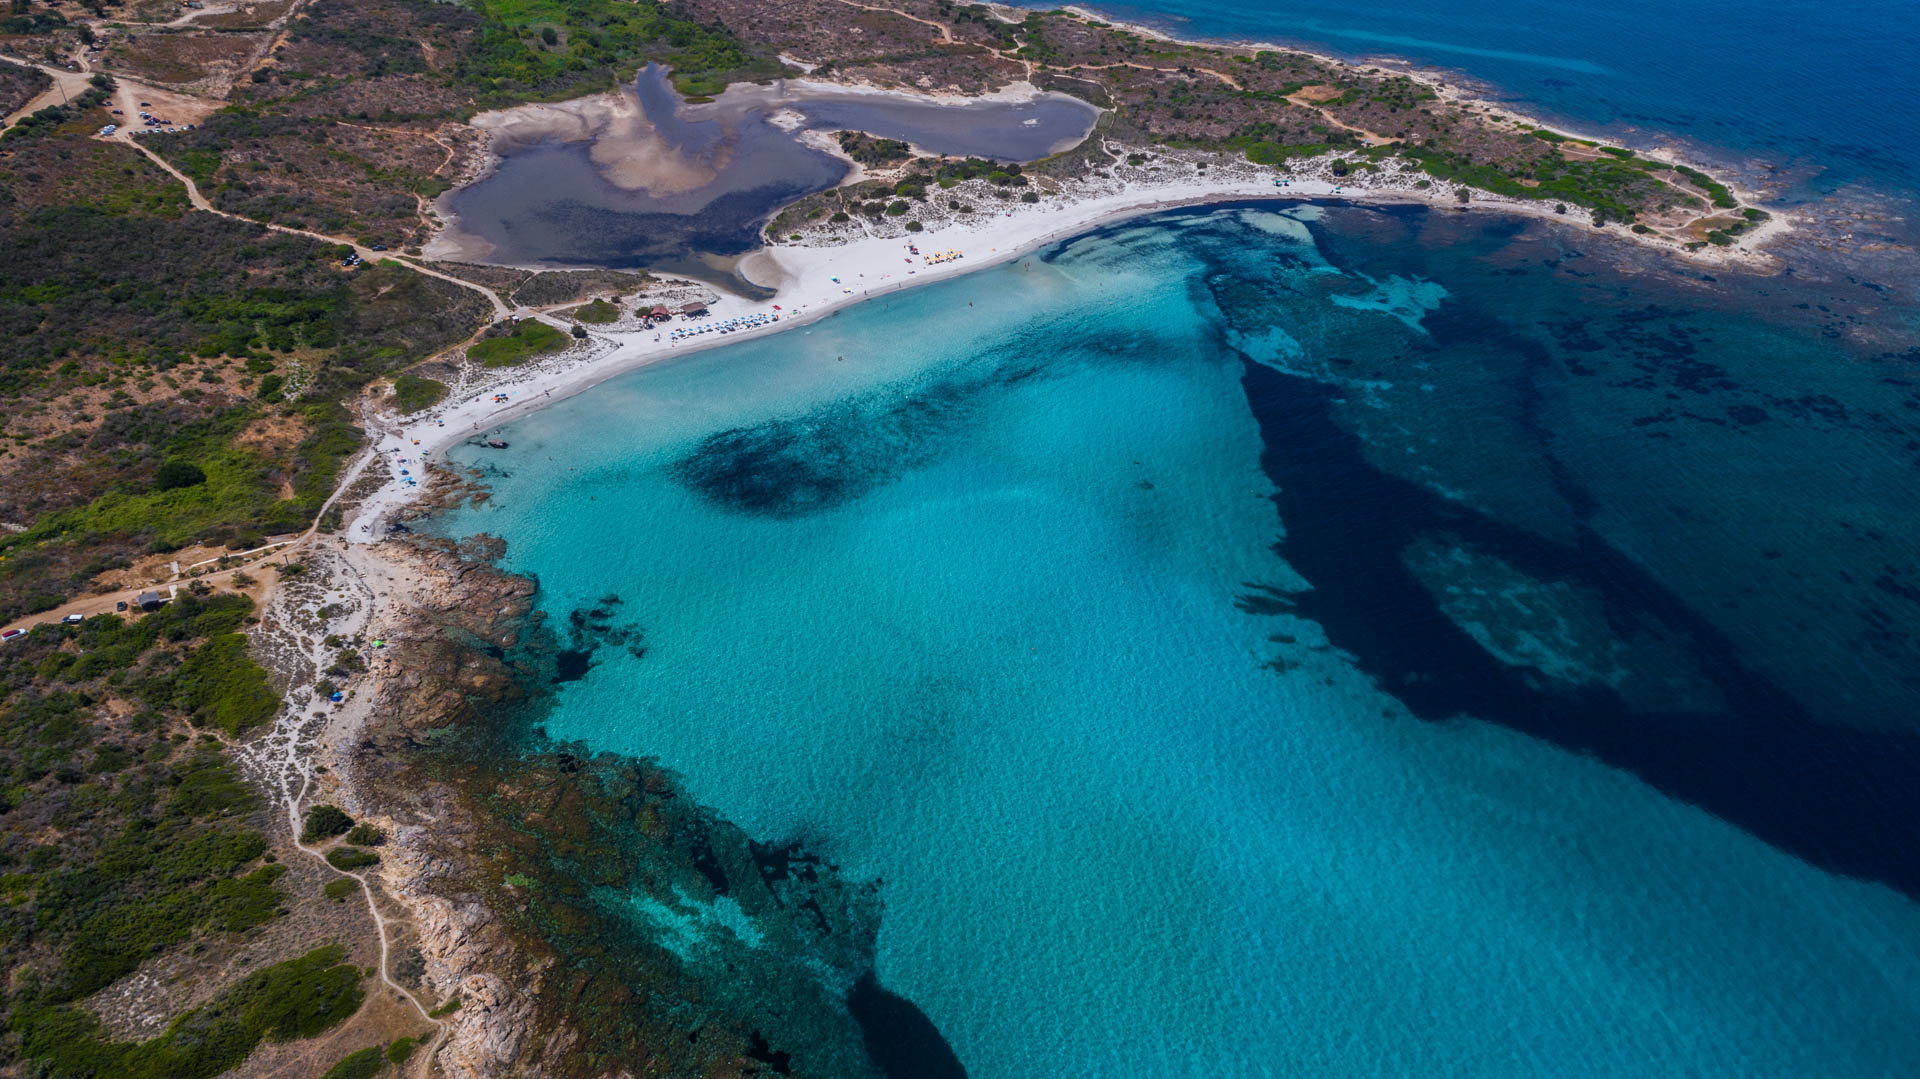 Cala Brandinchi Sardinia Aerial Photography drone Enrico Pescantini